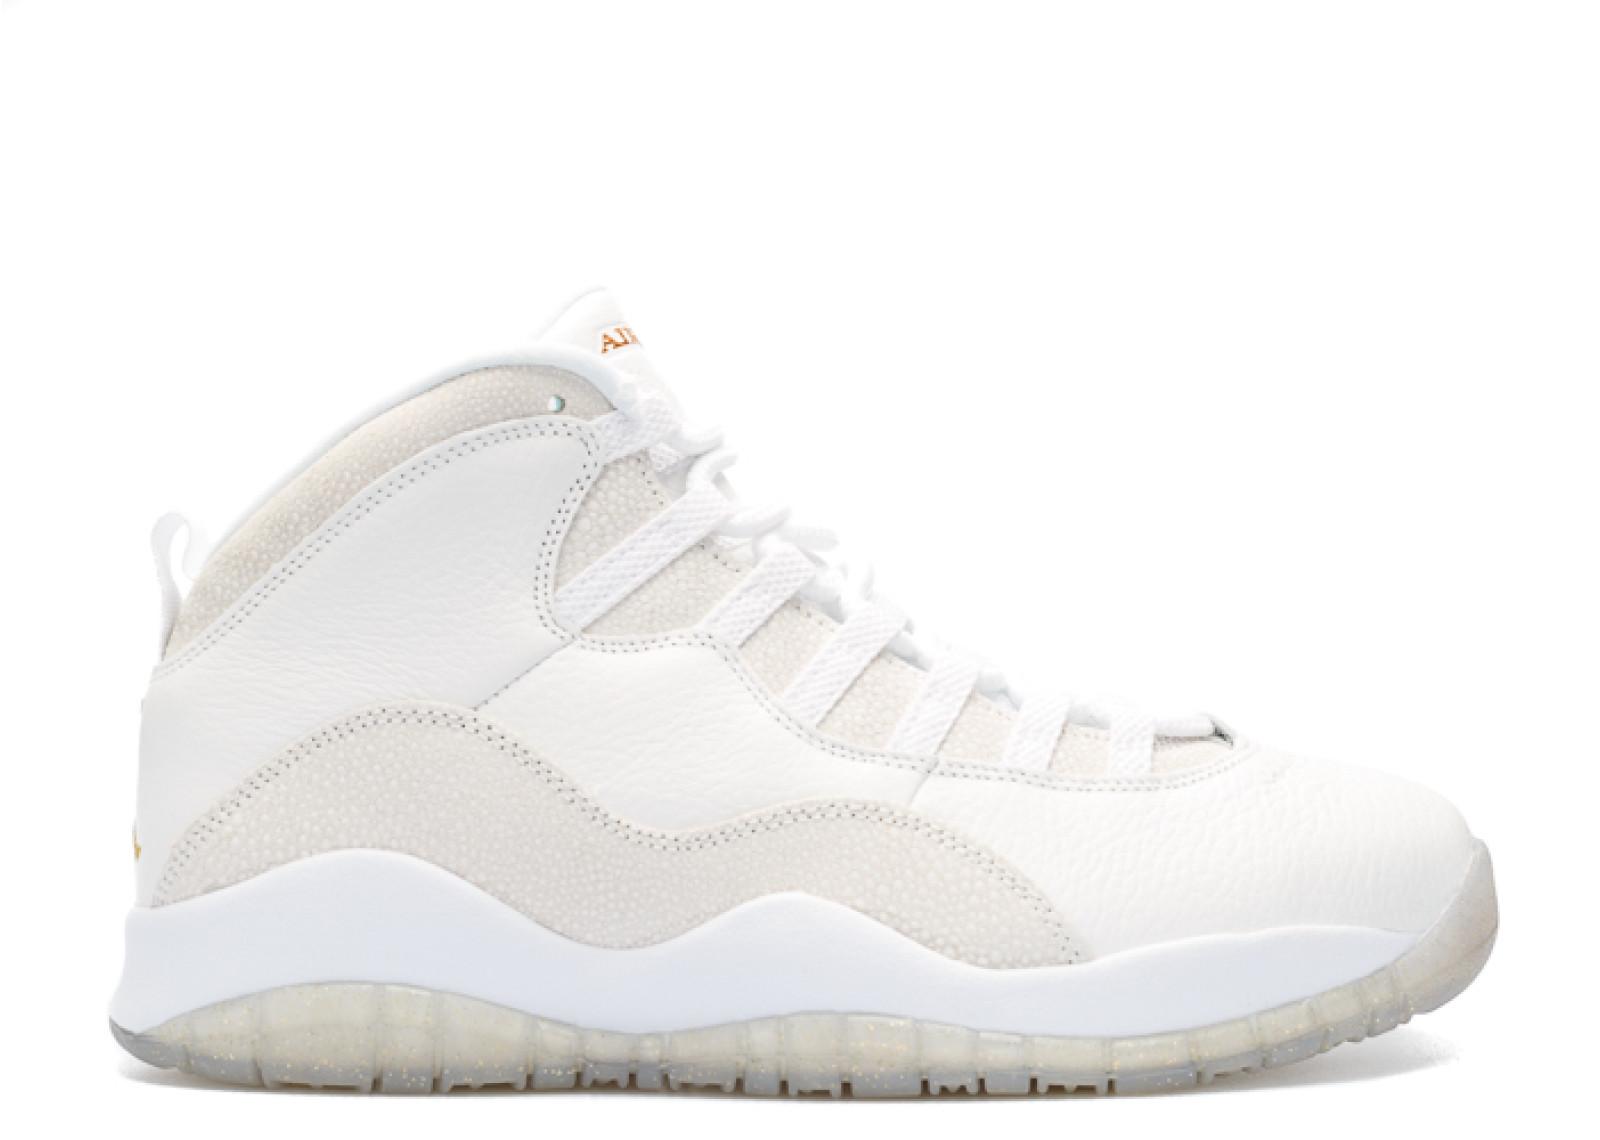 1858f3533283 Air Jordan - Men - Air Jordan 10 Retro Ovo  Ovo  - 819955-100 - Size 9.5